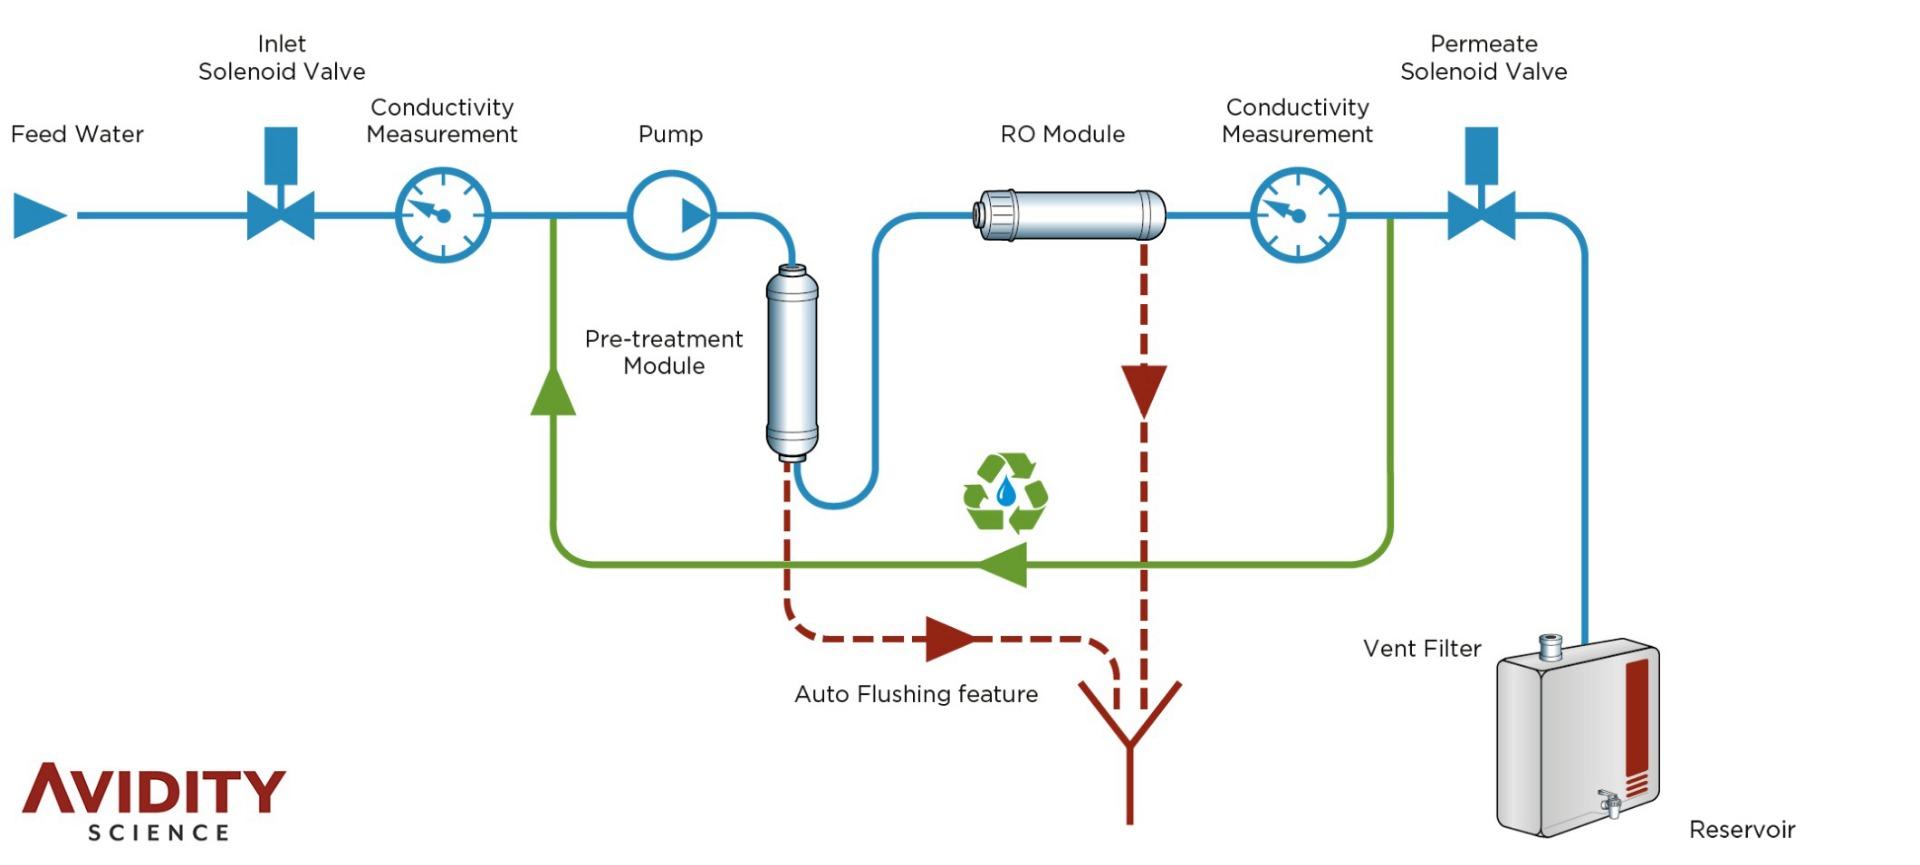 Avidity Science Puro RO Water System Flowchart